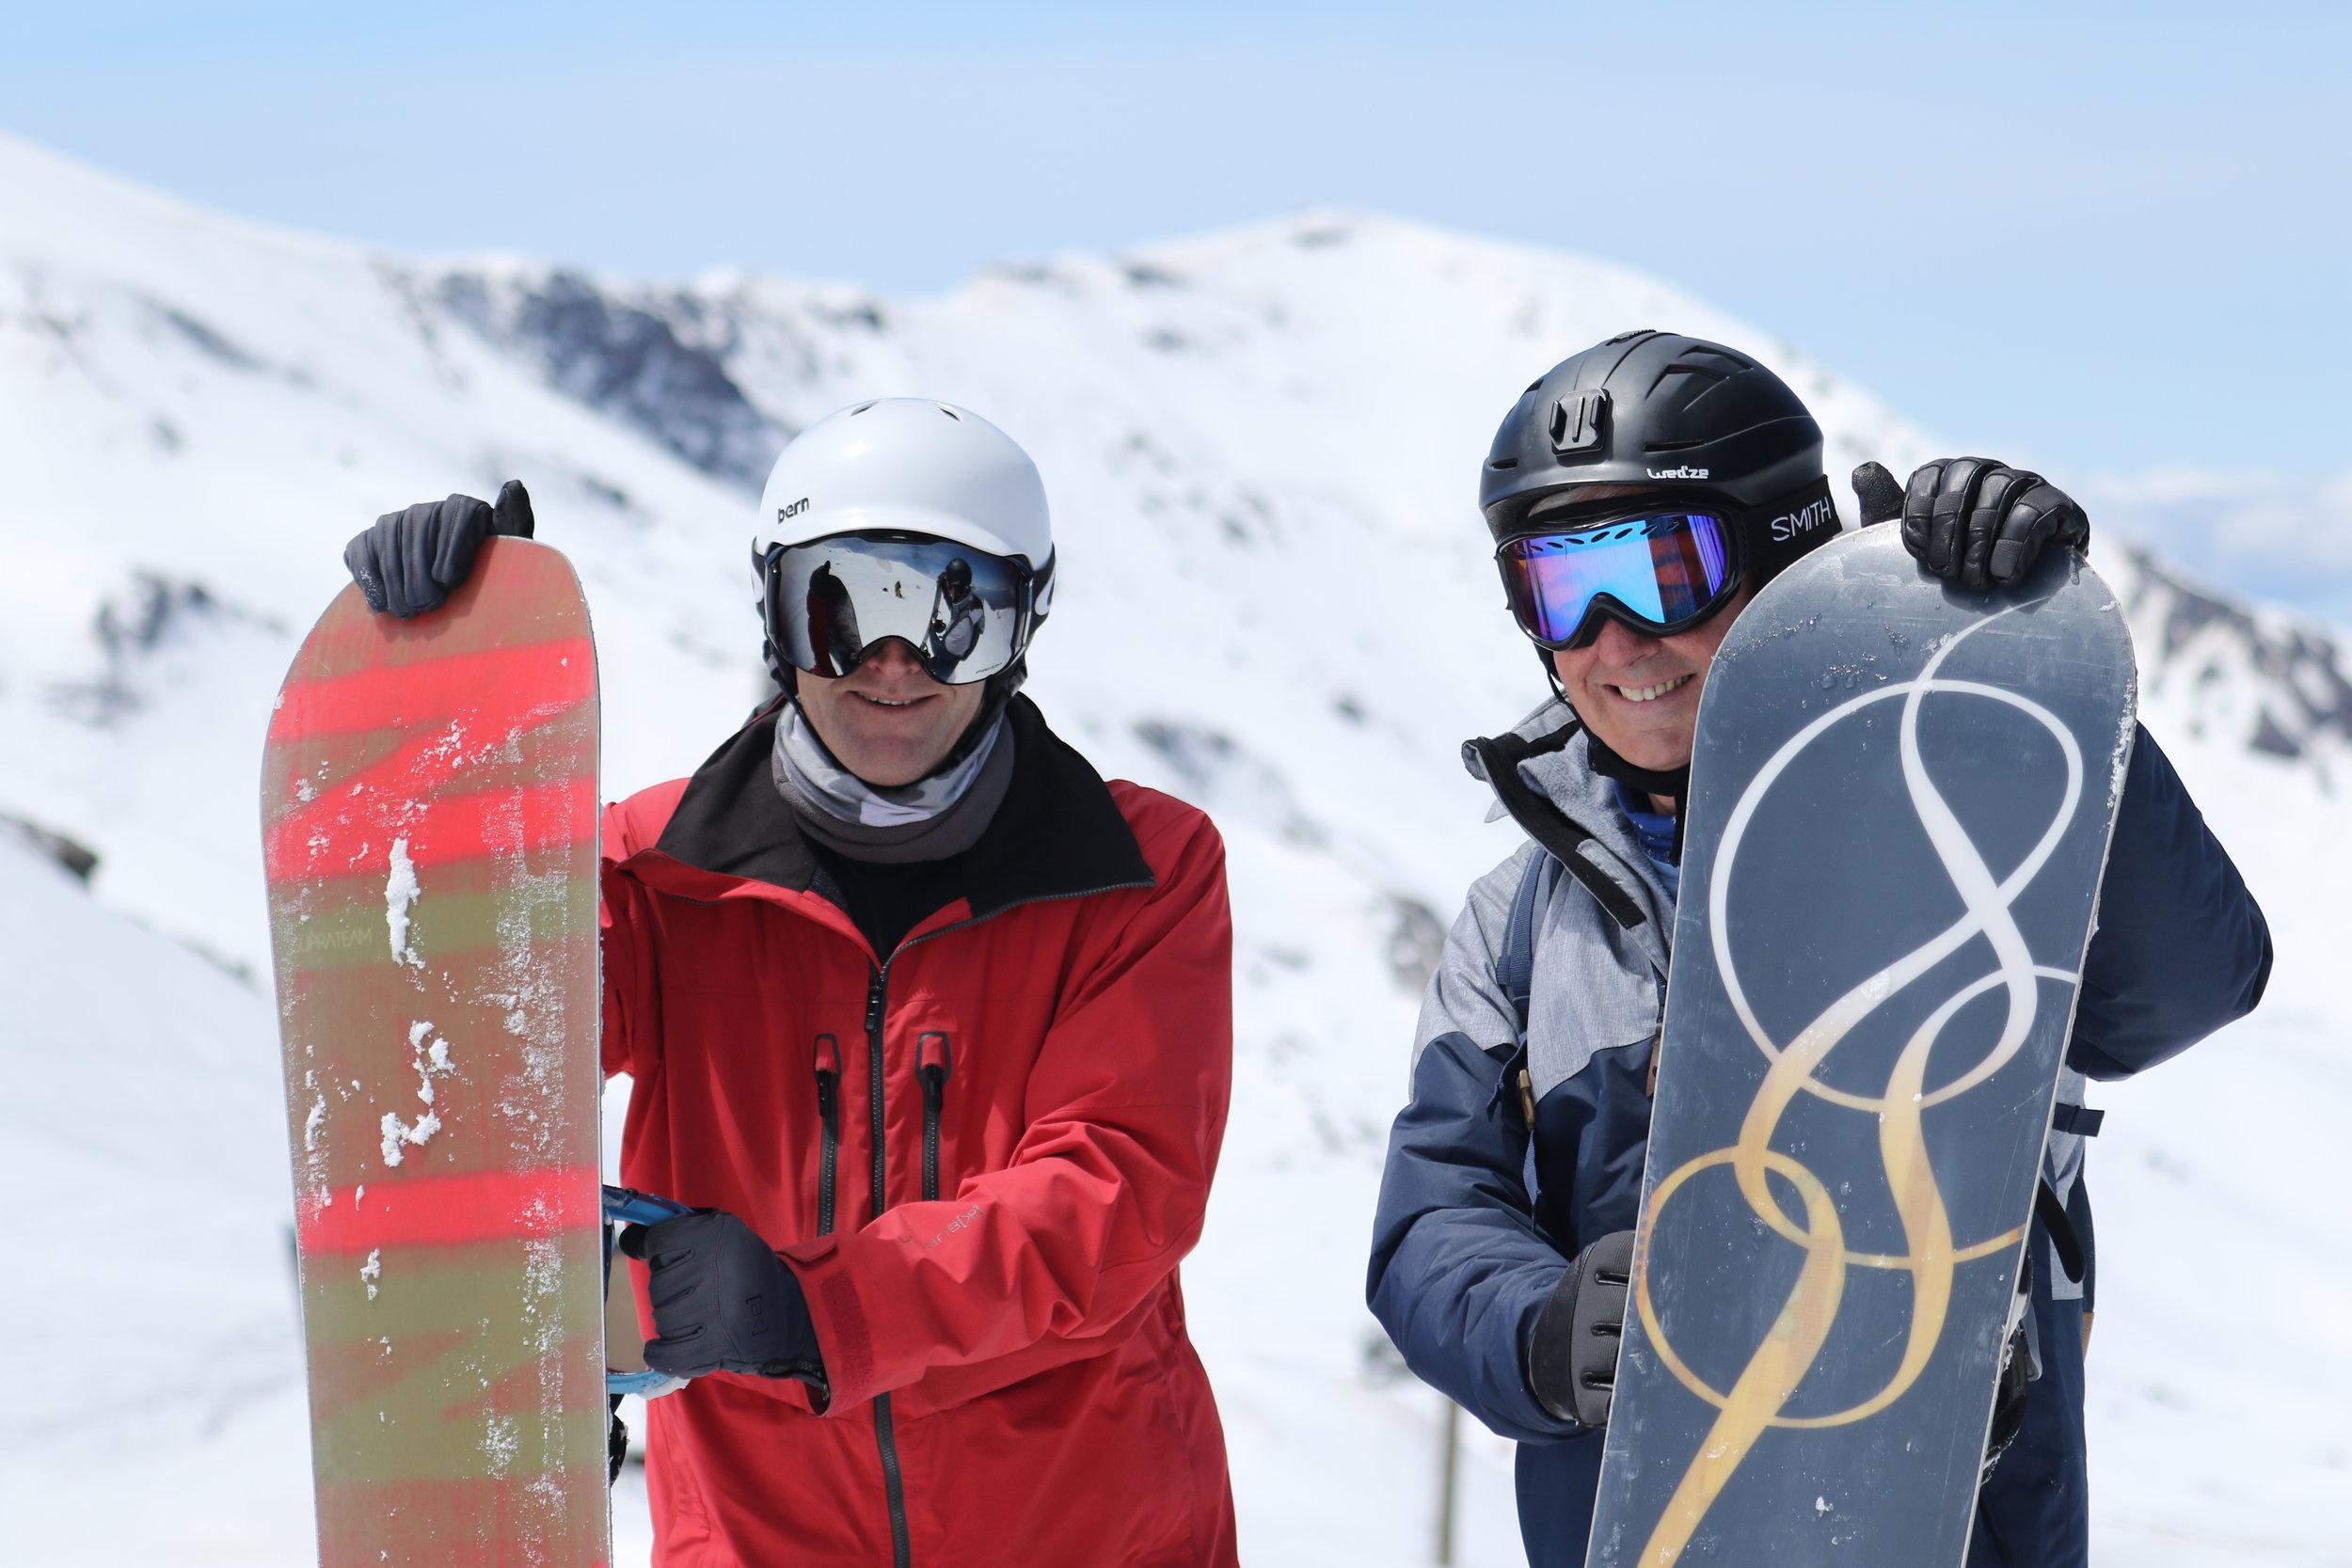 English Ski School Snowboarders